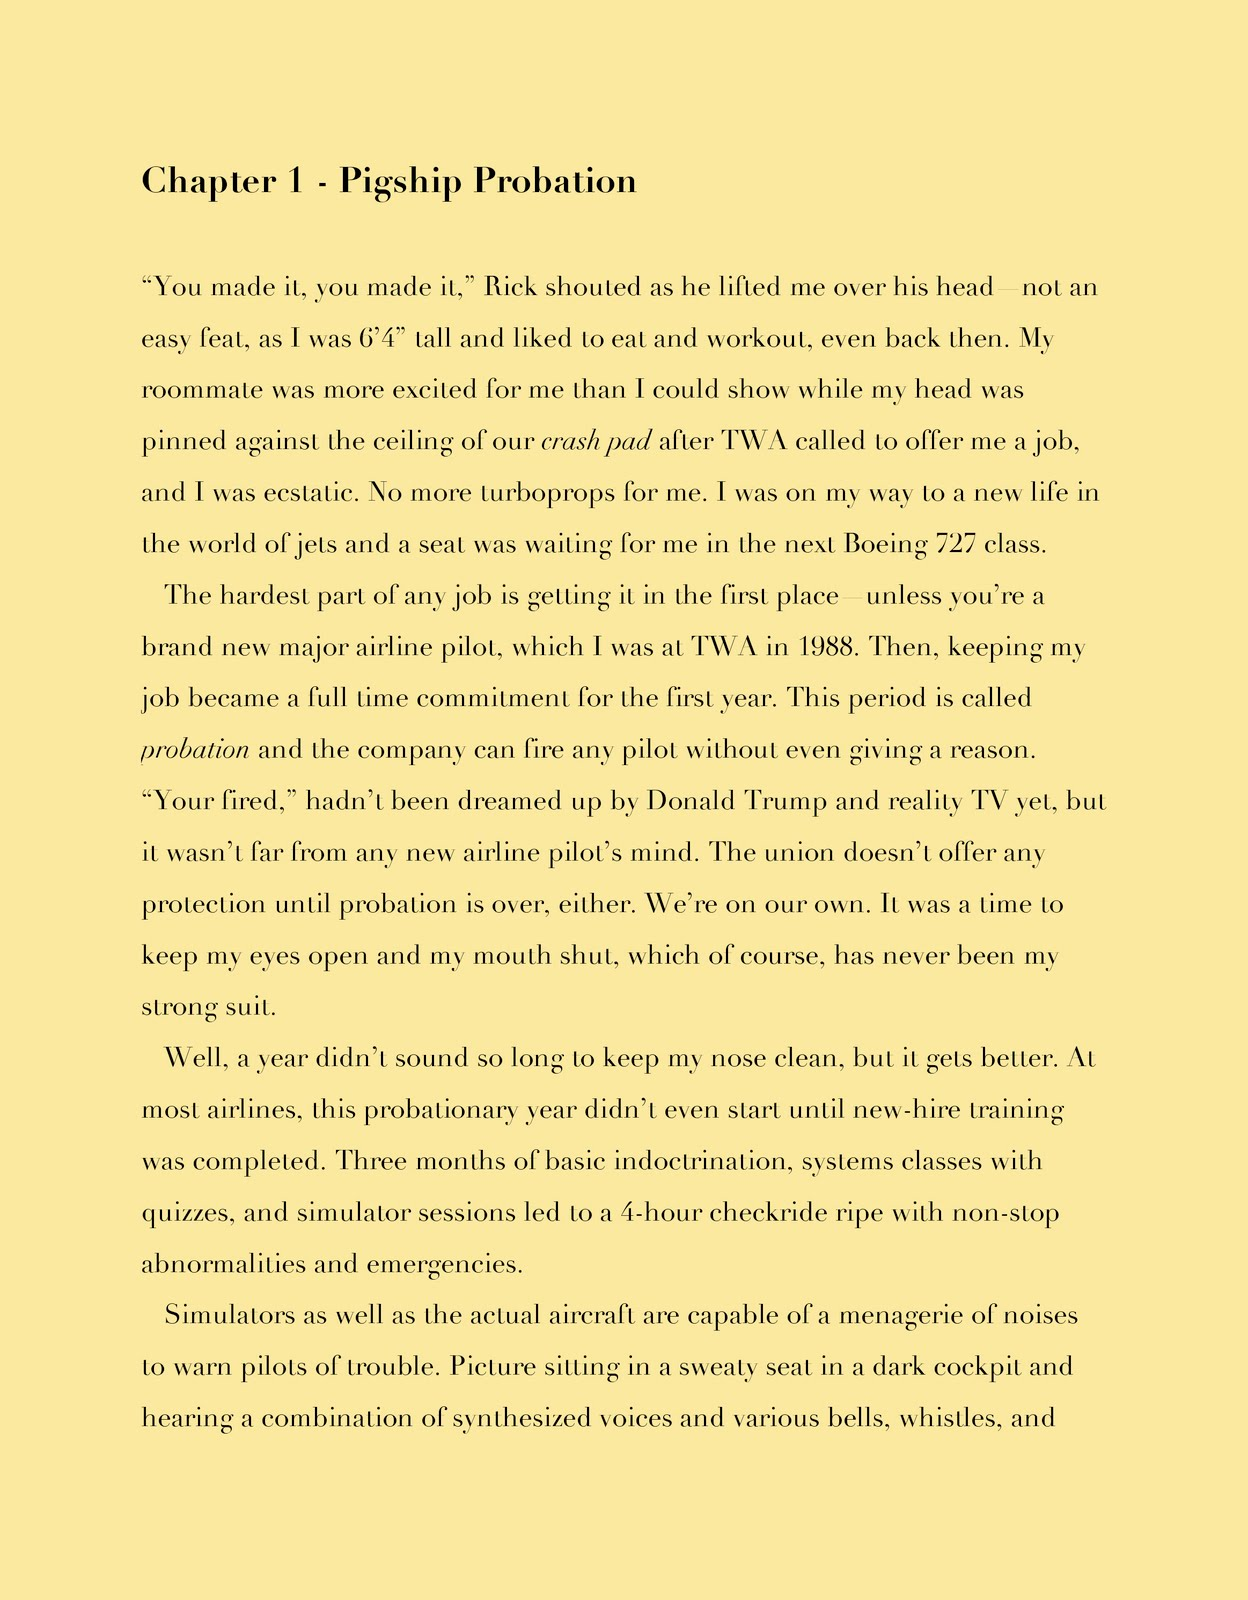 Cosloy scholarship essay